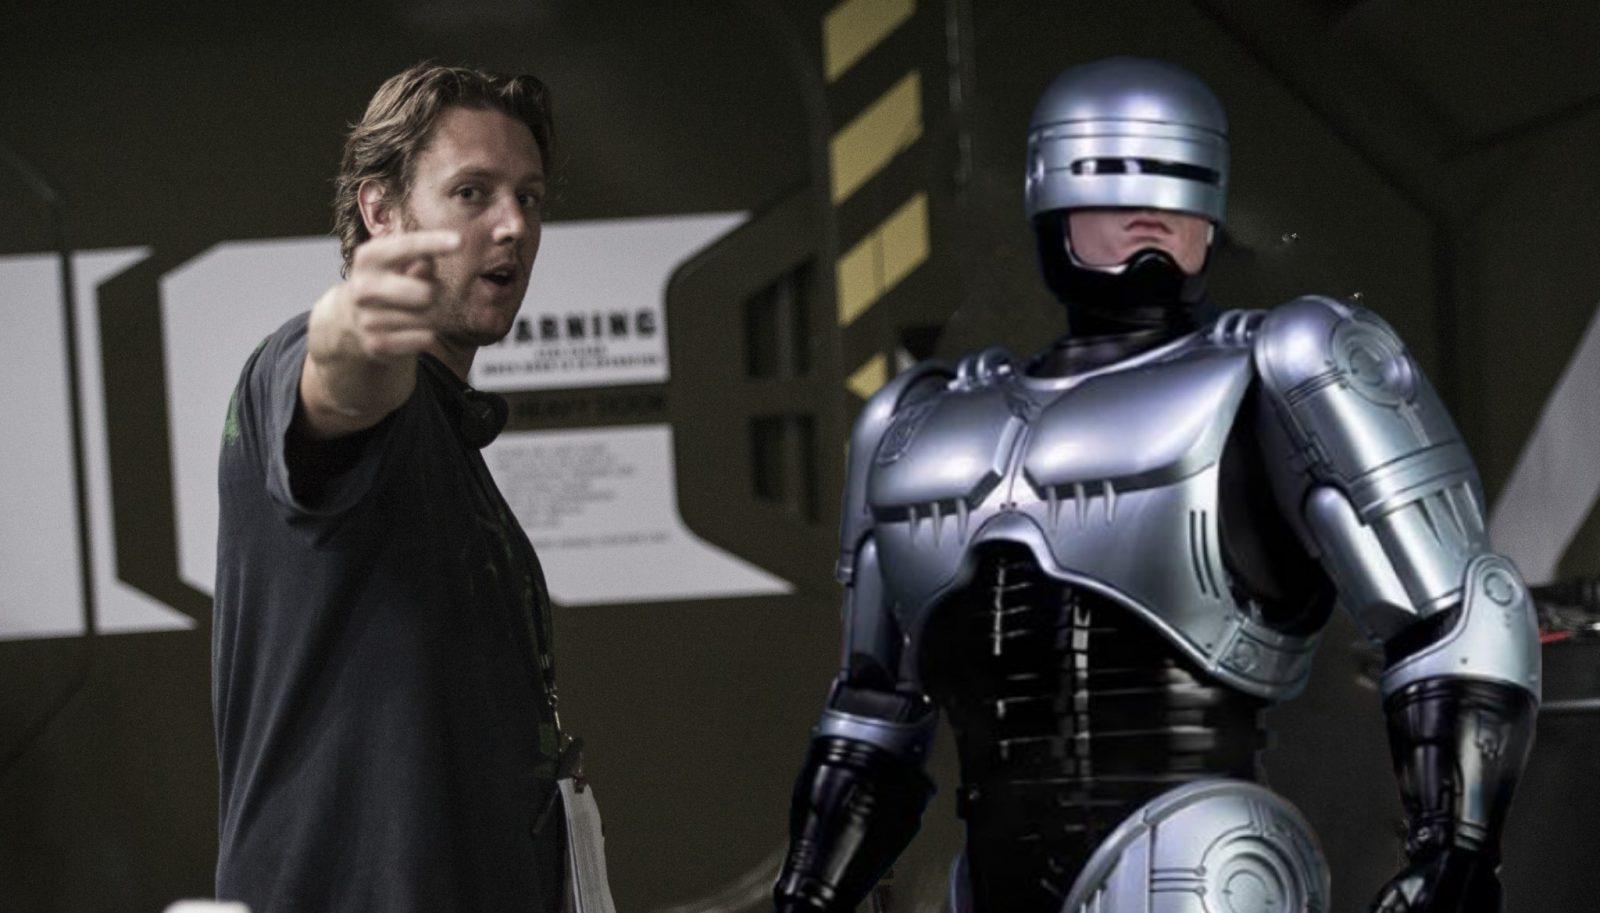 Neill Blomkamp, Robocop Returns, Alien 5